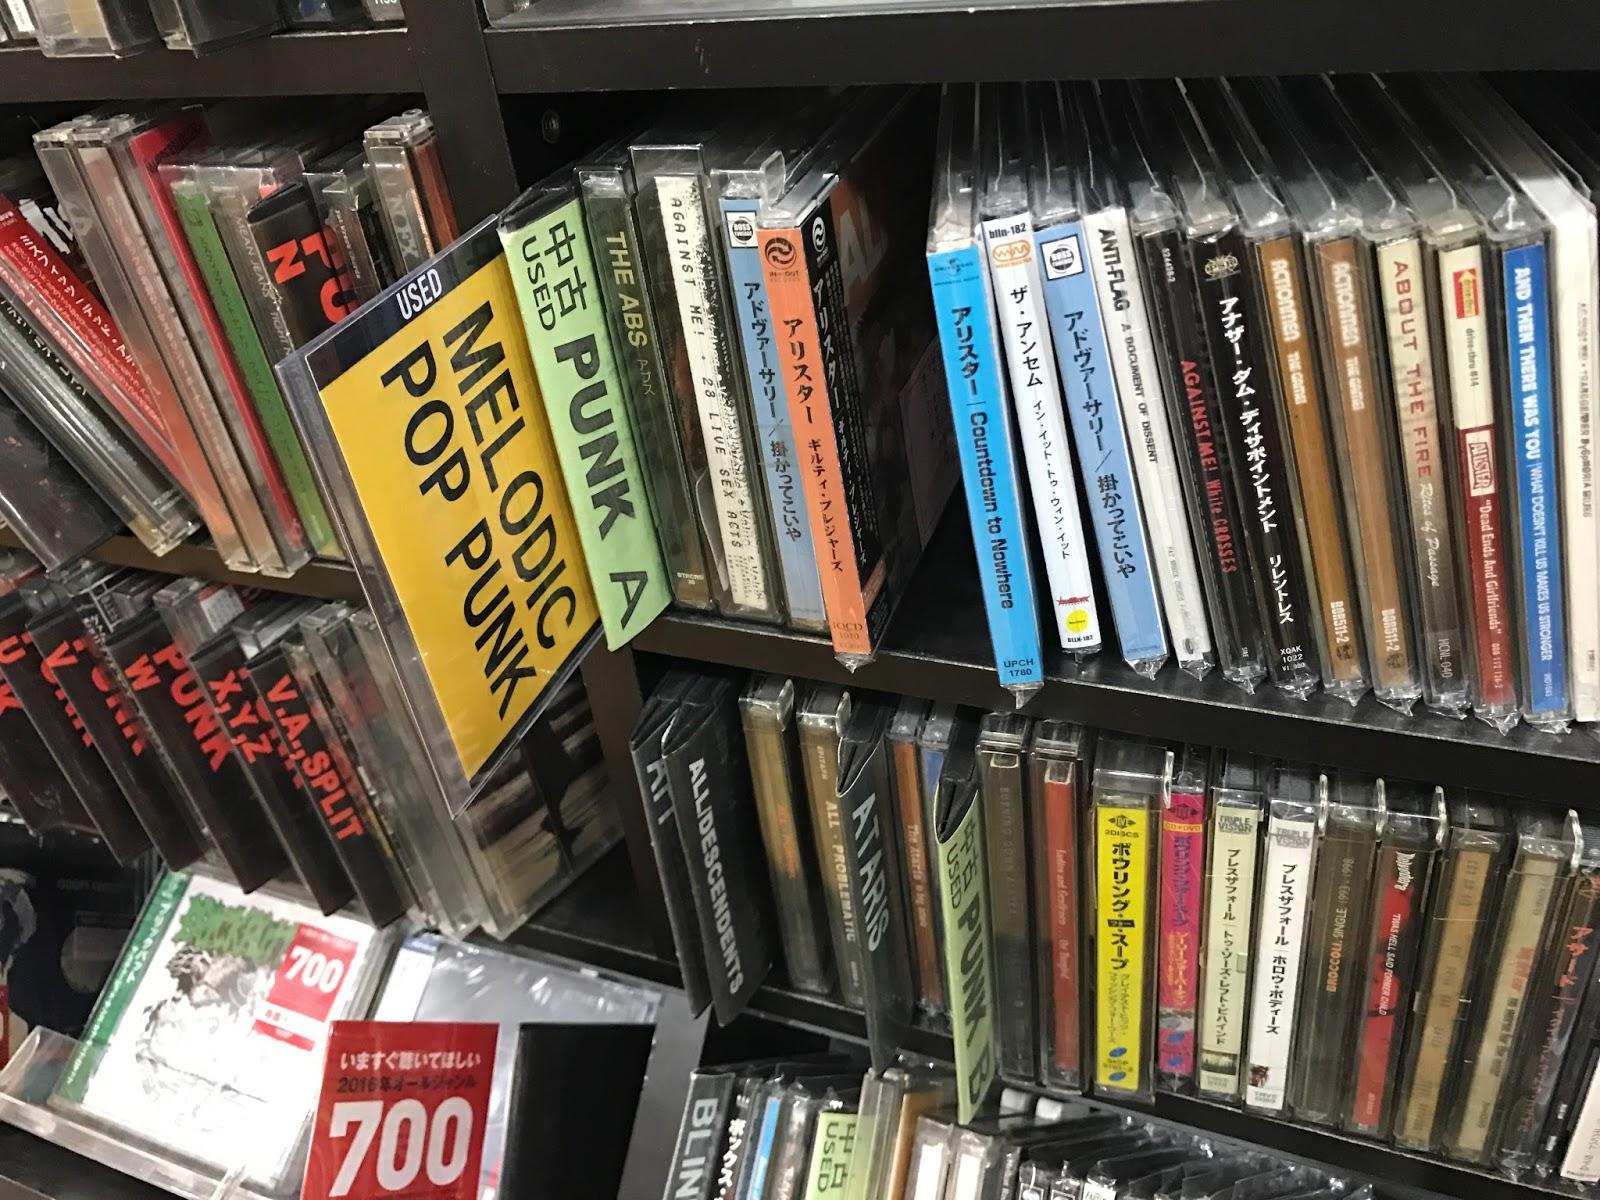 I Buy Way Too Many Records Dot Com: Record Store Visit: Disk